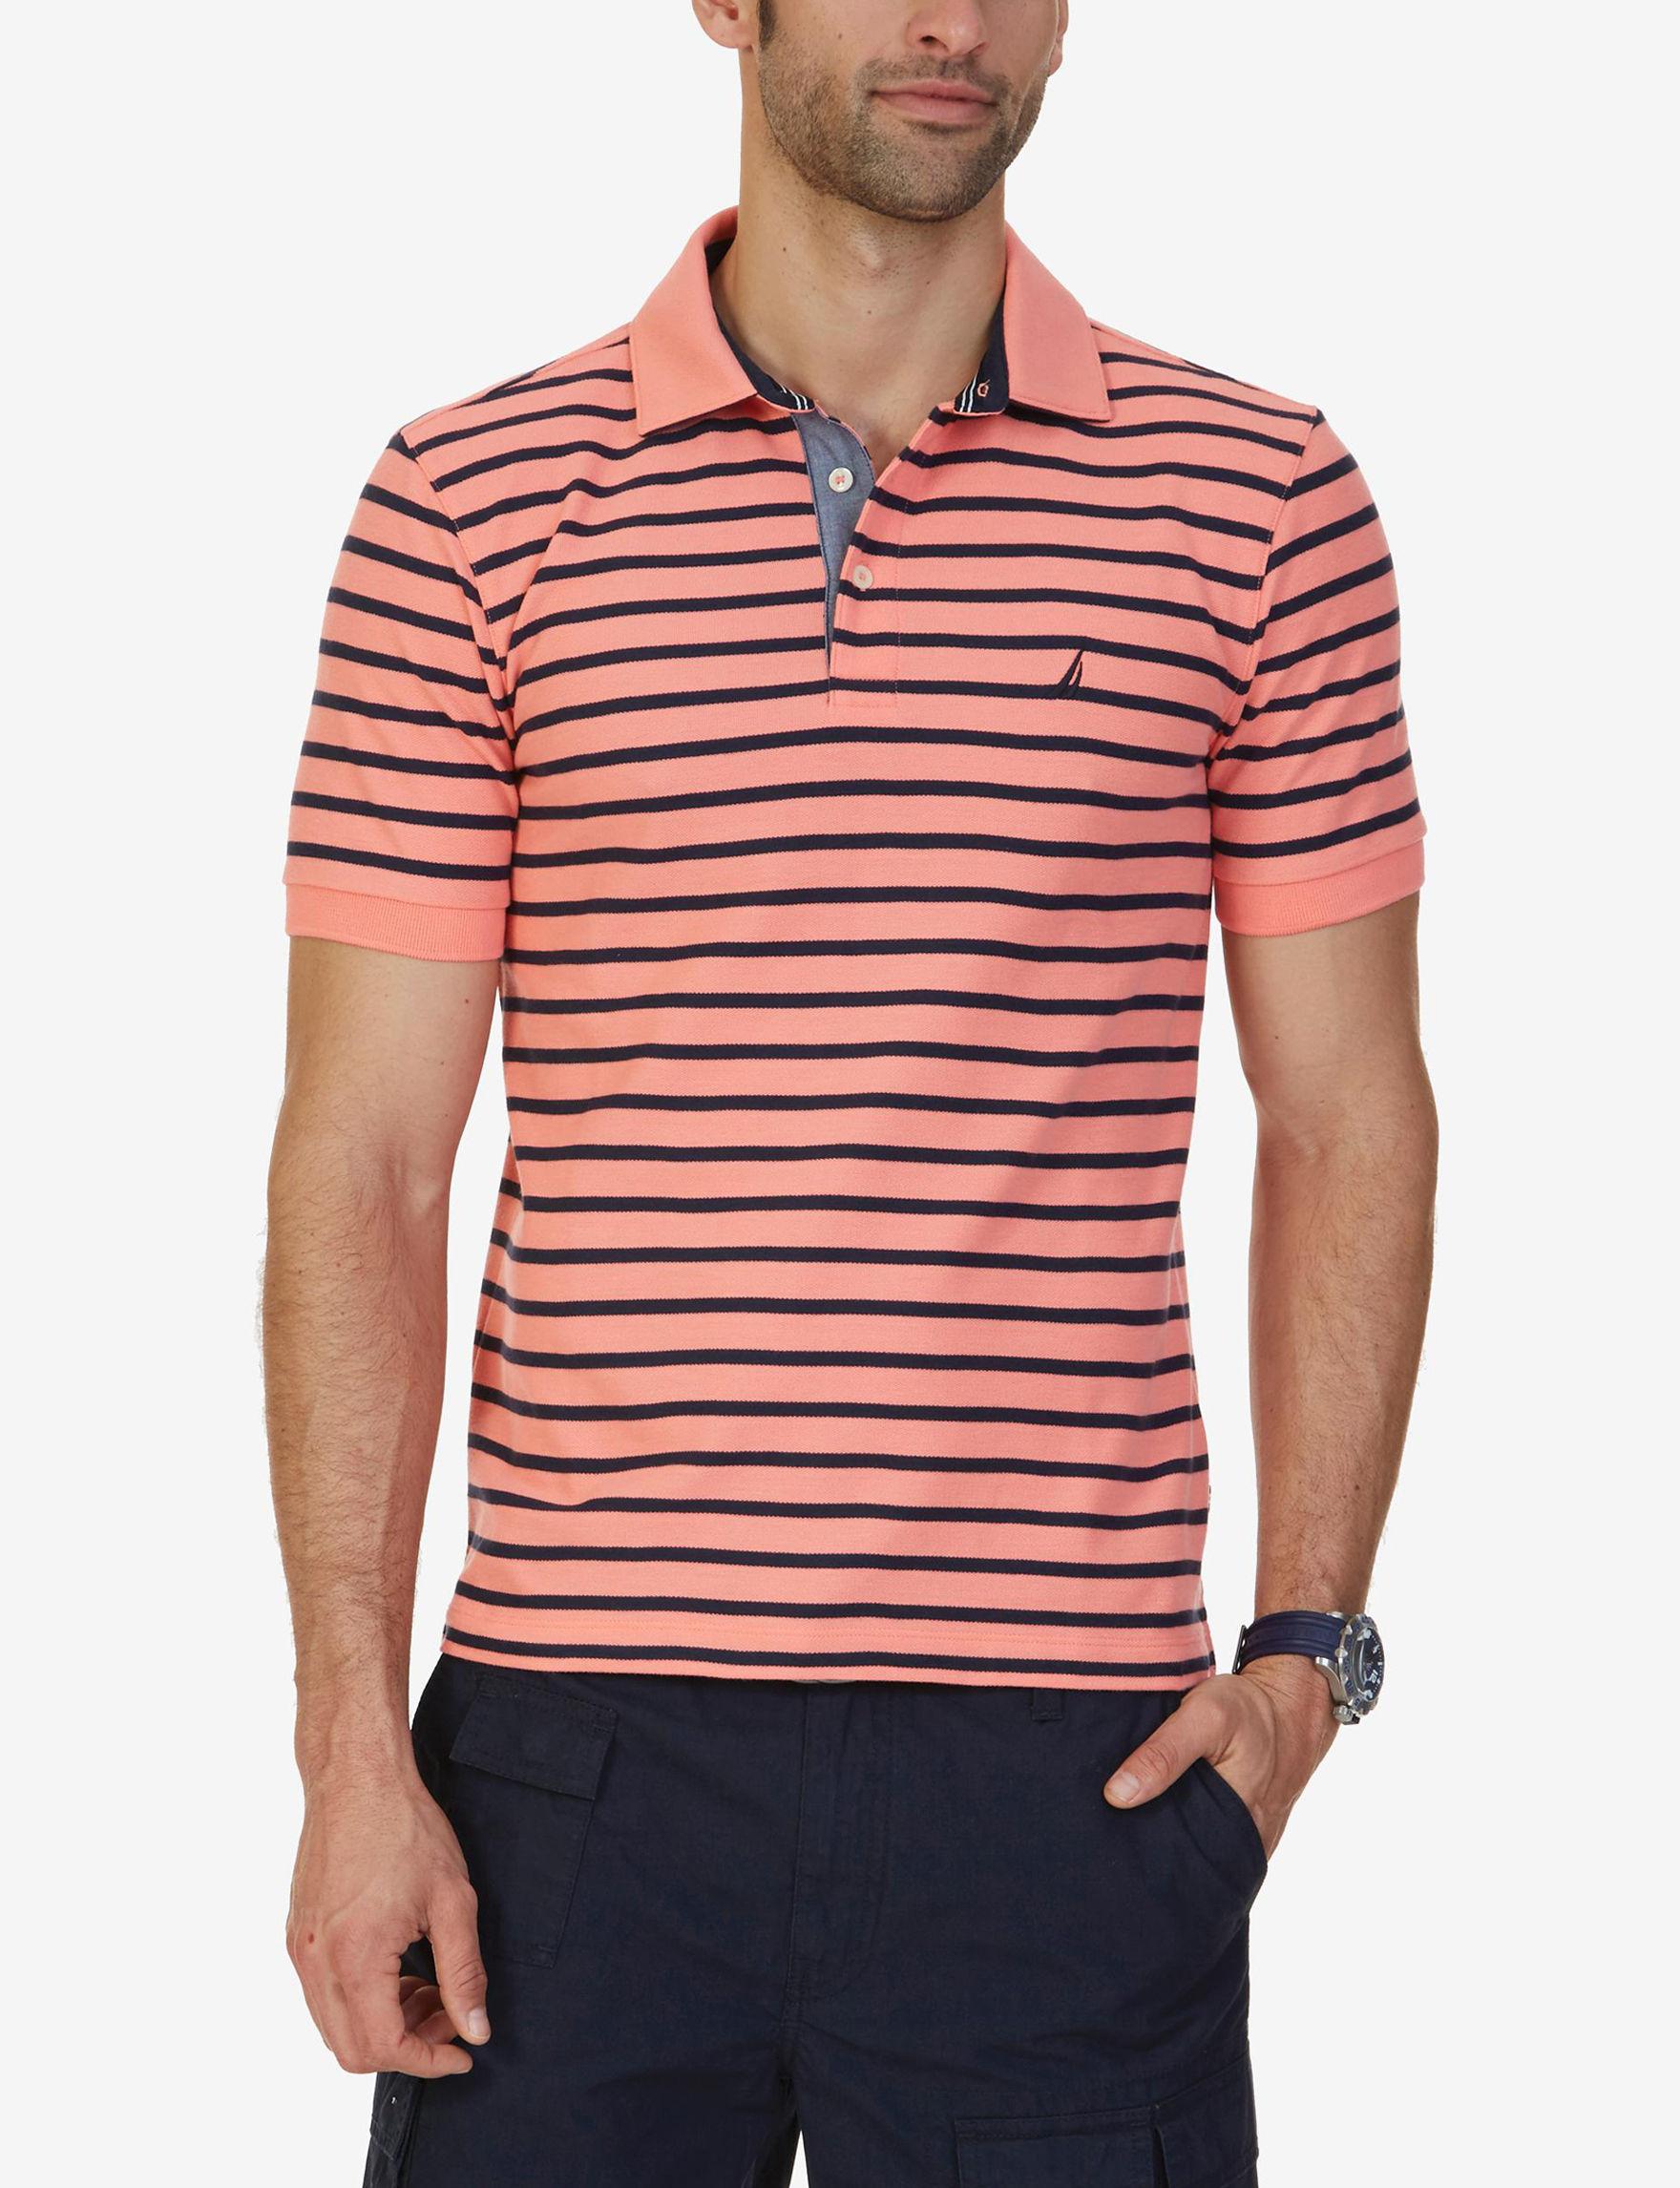 Nautica Moisture Wicking Polo Shirt Stage Stores